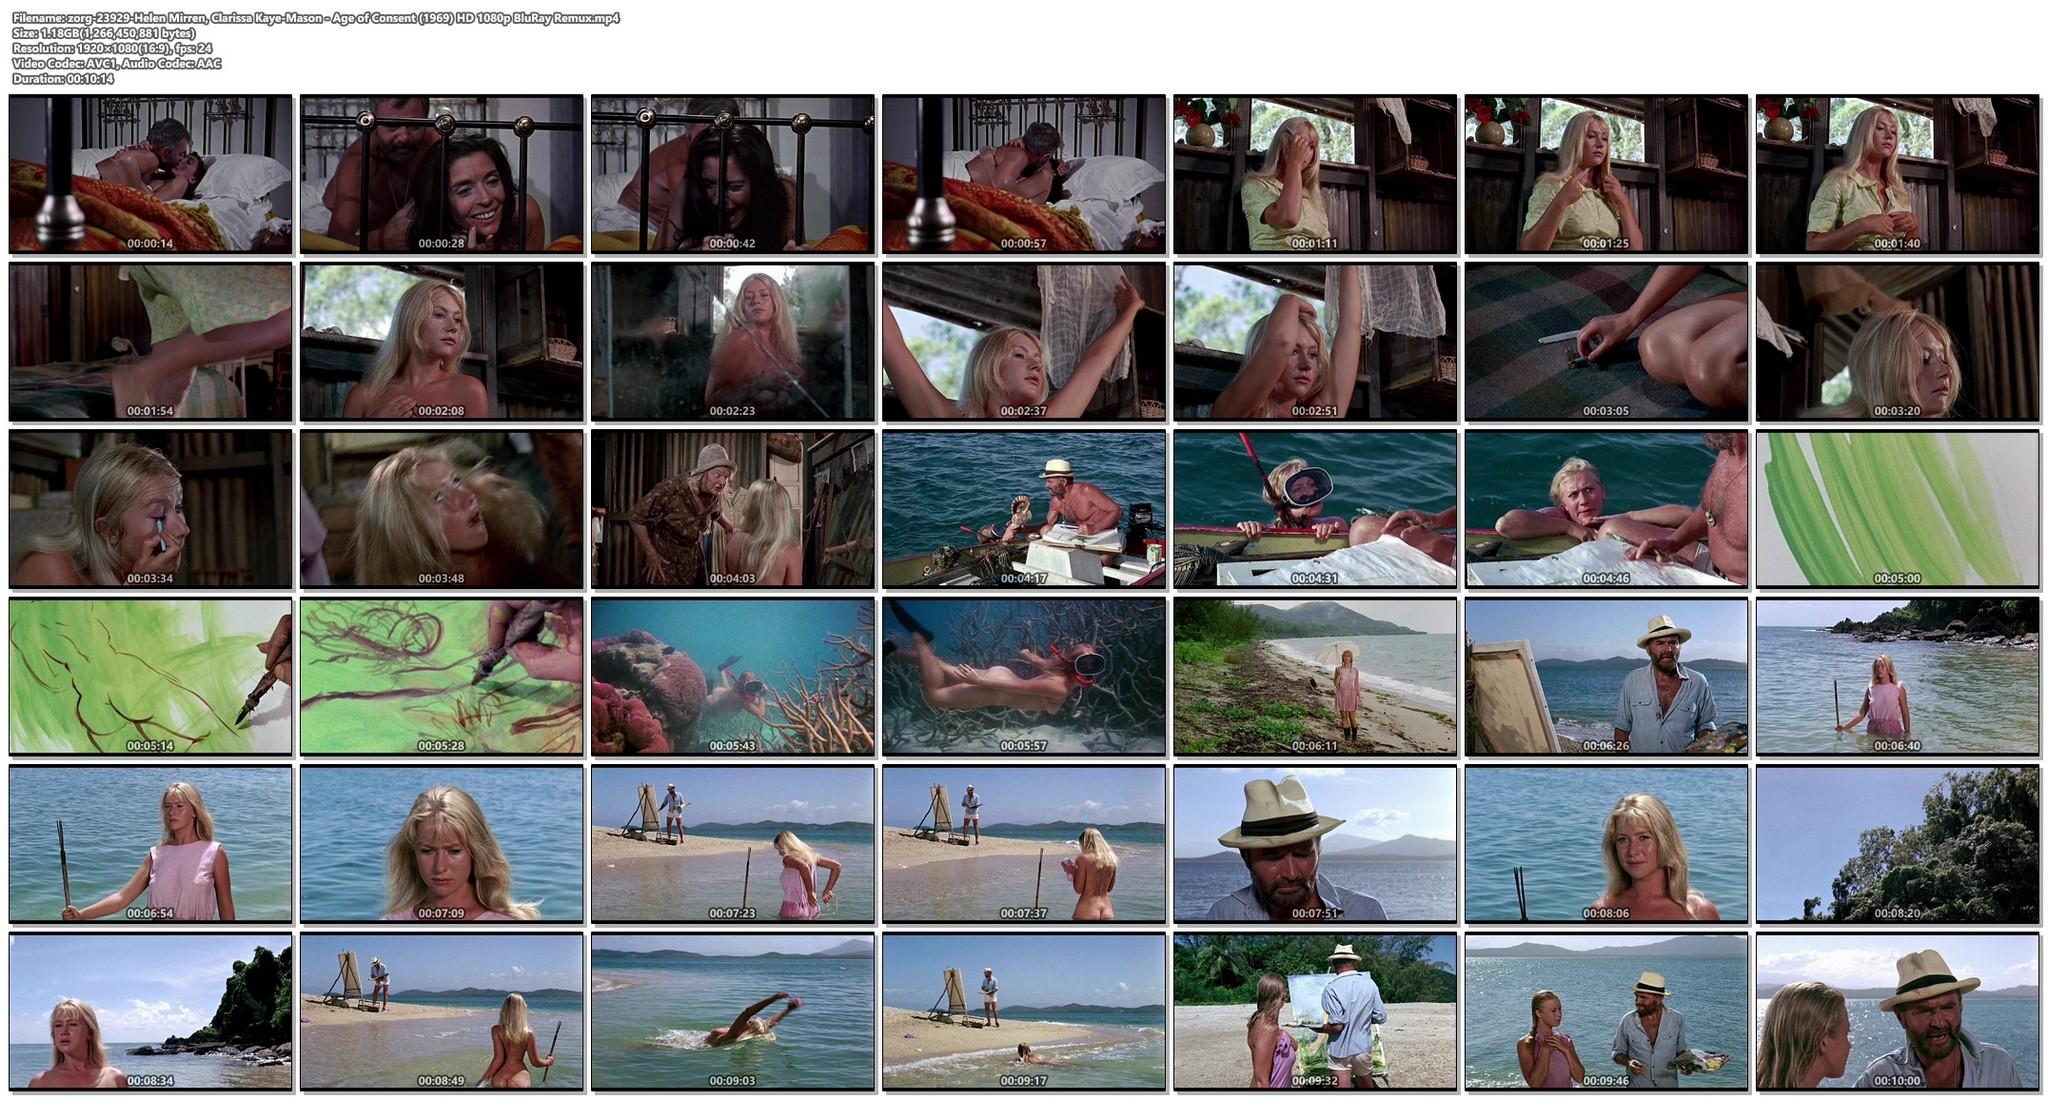 Helen Mirren nude skinny dipping Clarissa Kaye-Mason nude sex - Age of Consent (1969) HD 1080p BluRay Remux (1)